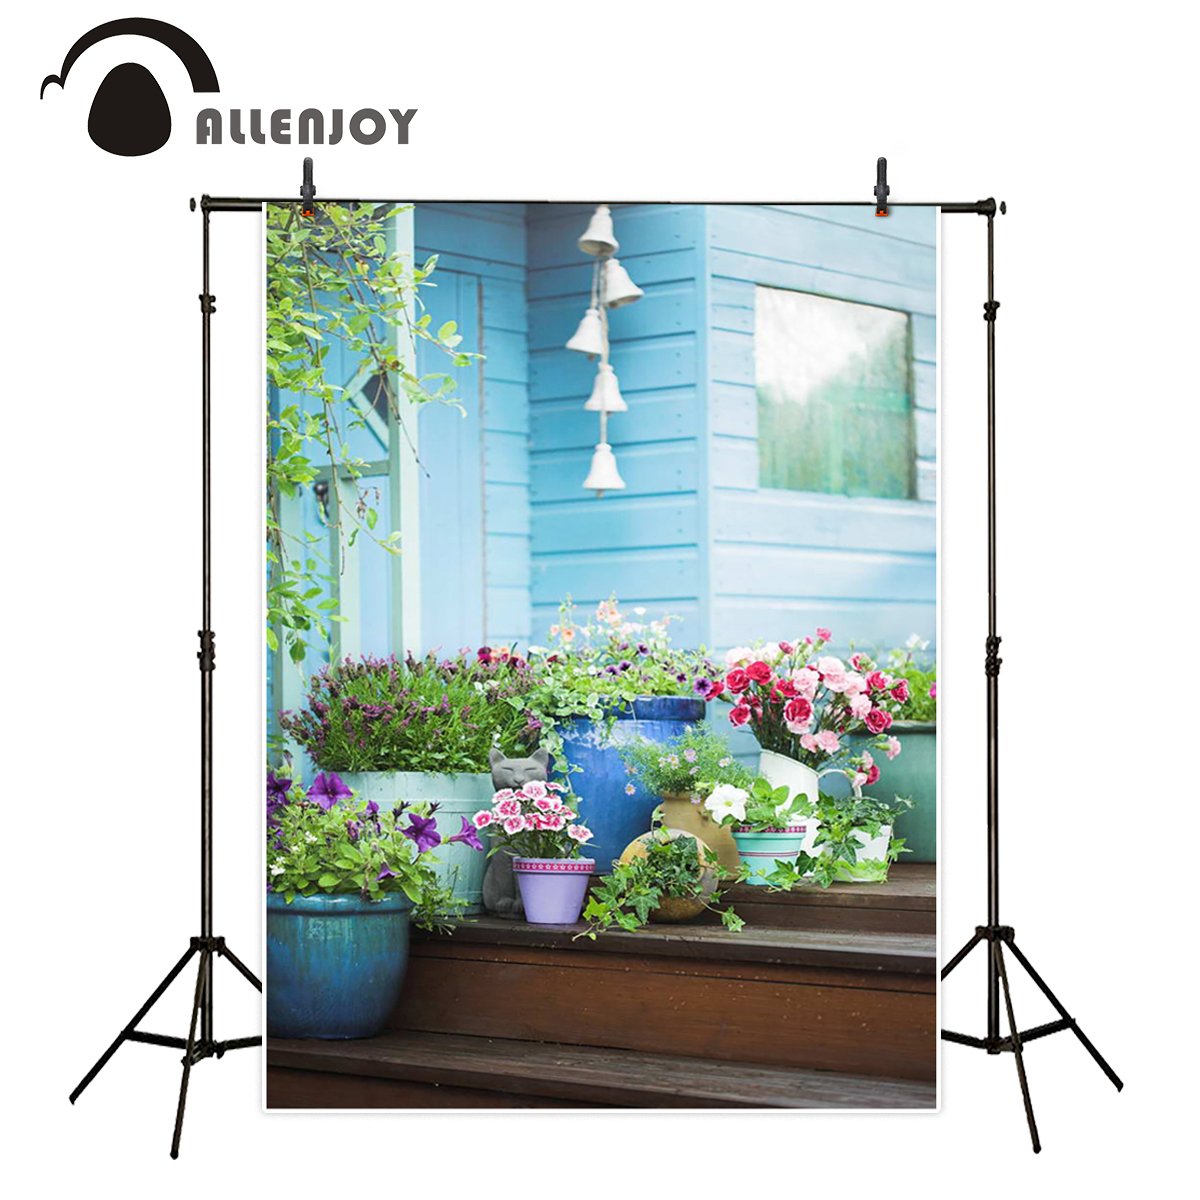 Allenjoy photography backdrops countryside bonsai cat background photography backgrounds for photo studio 200*300cm цена